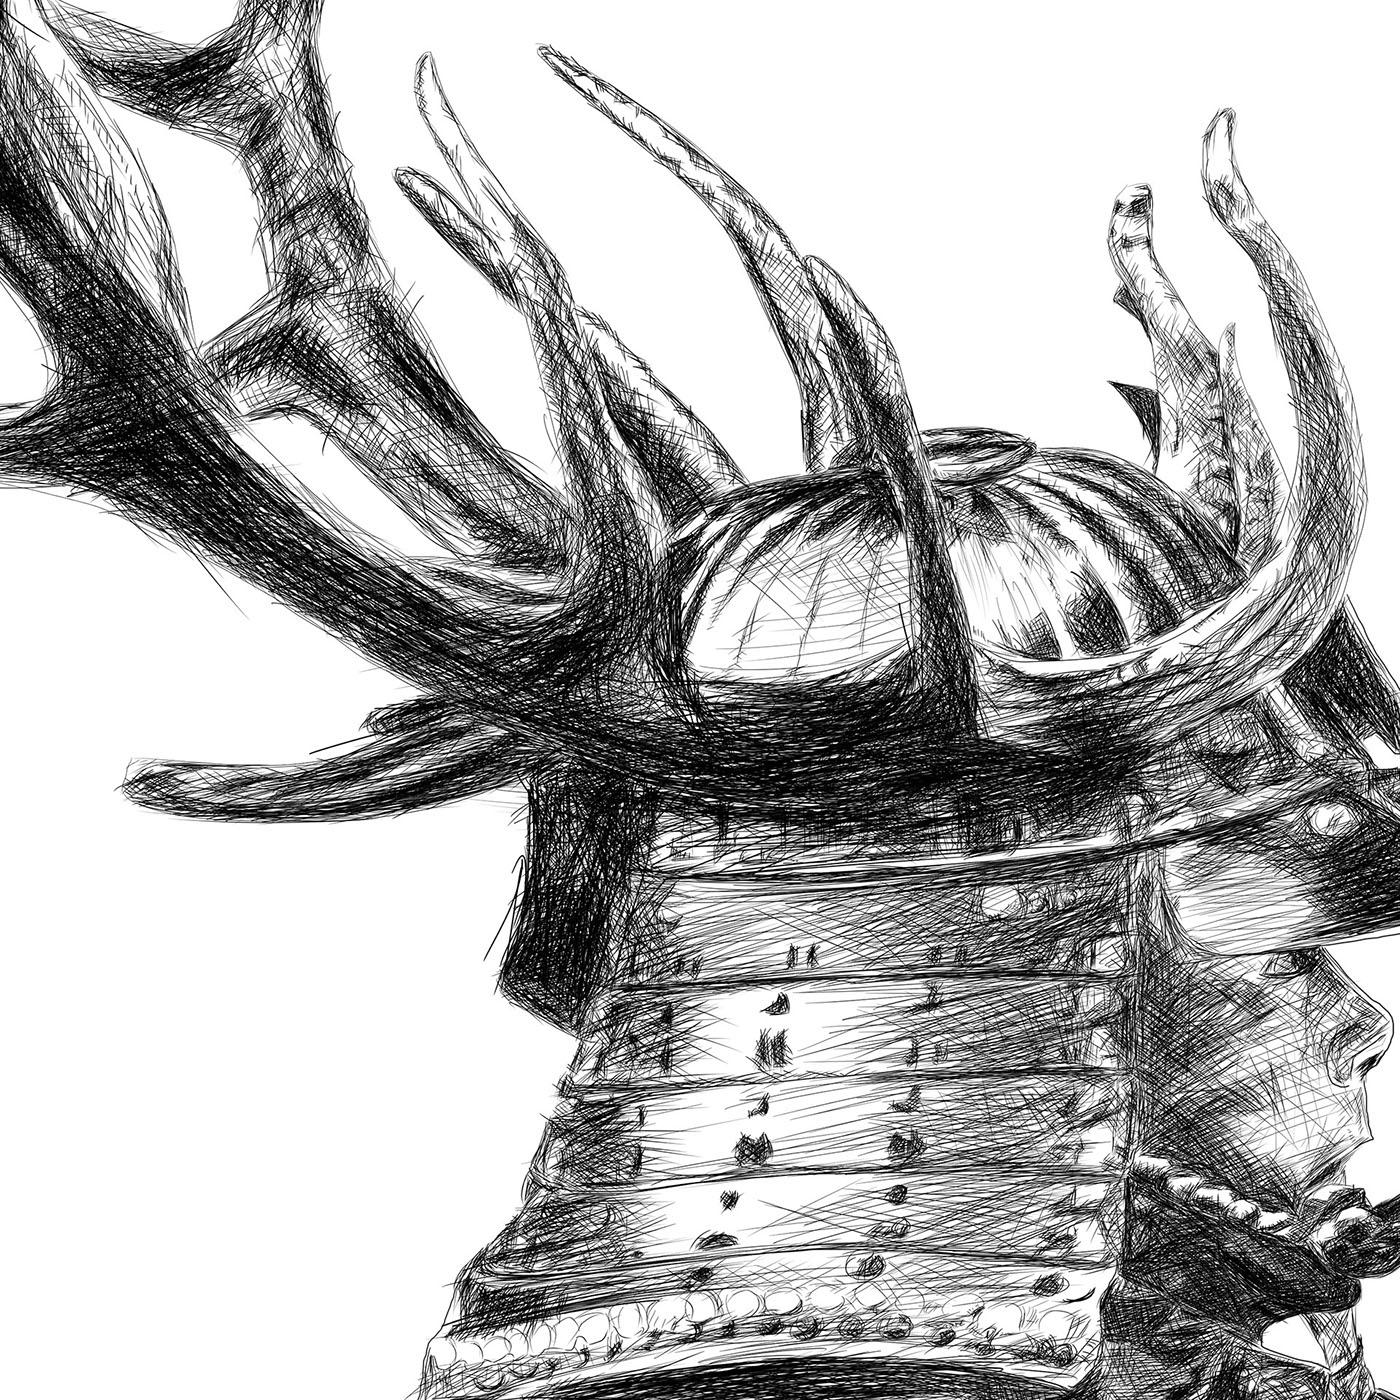 Samurai line drawing digital pencil ציור קווי סמוראי עיפרון דיגיטלי closeup2